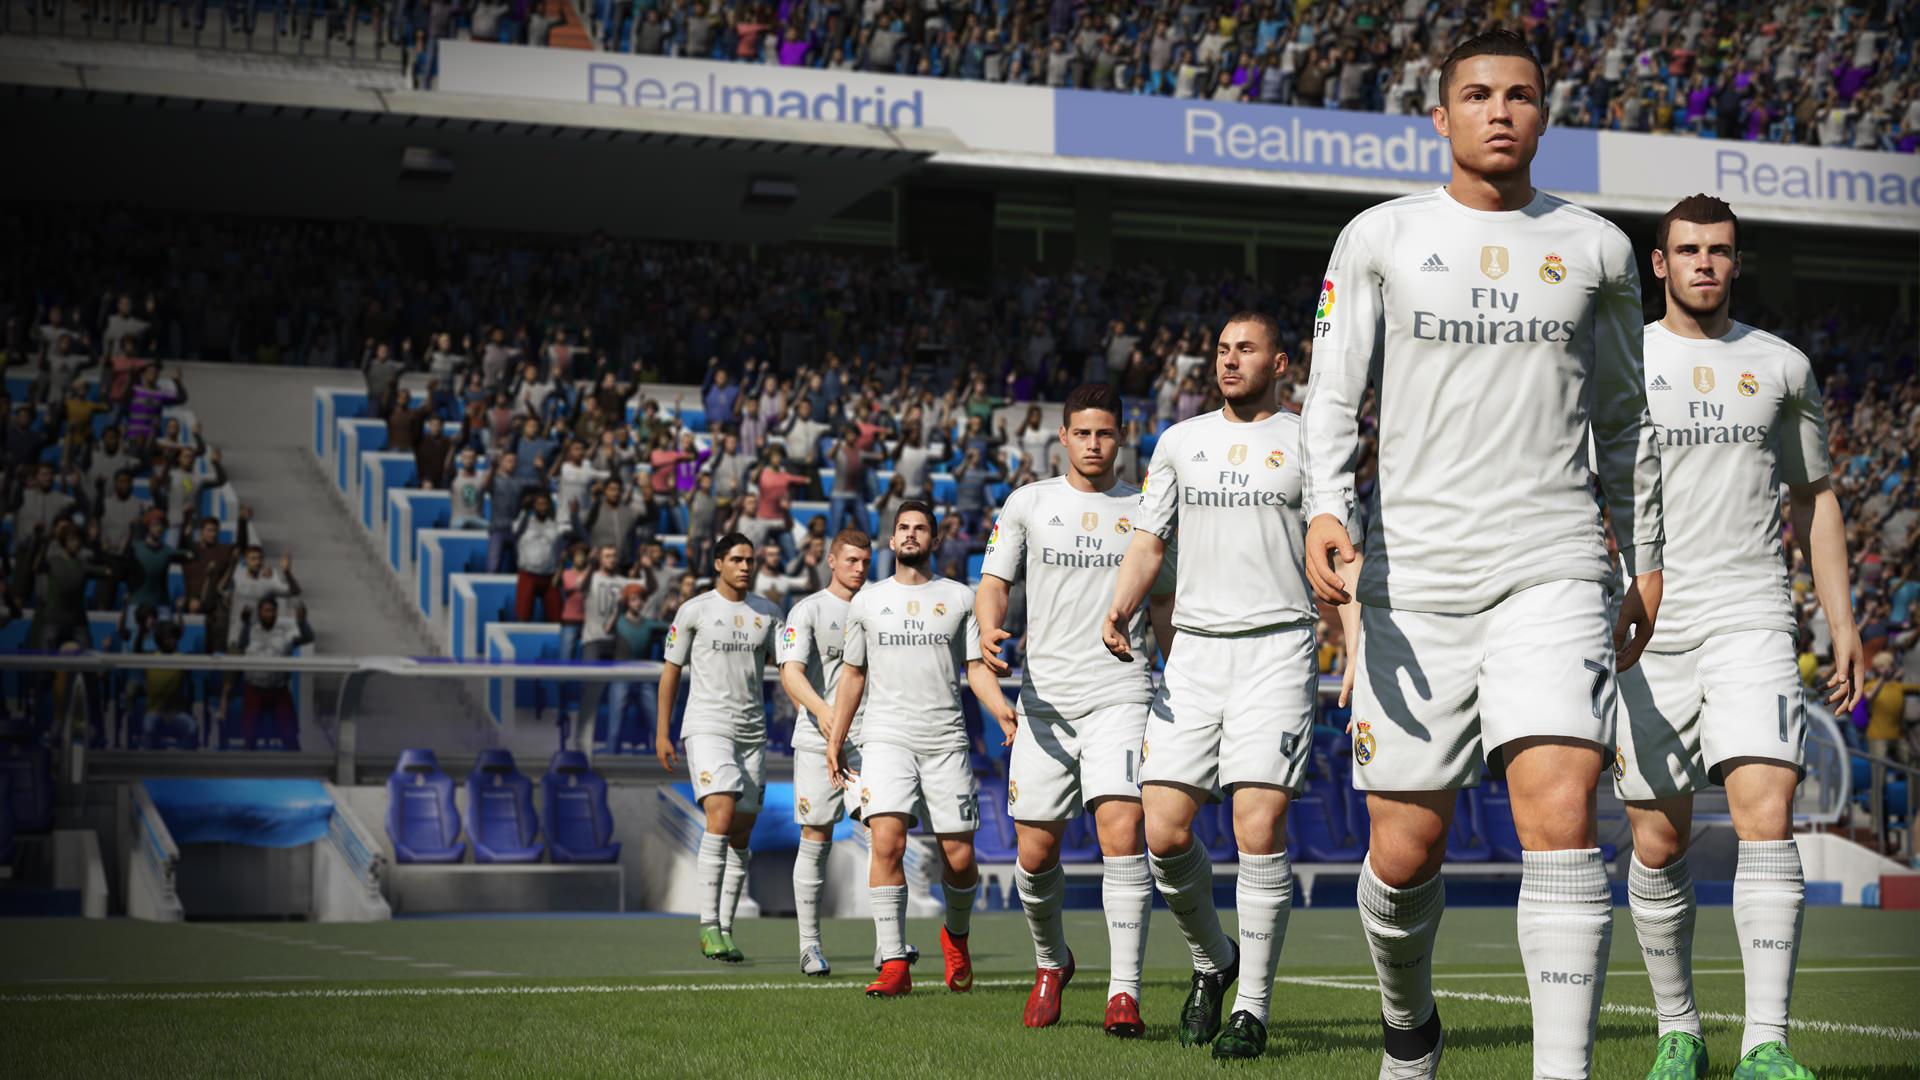 Fifa 17 Gameplay Real Madrid Wallpaper